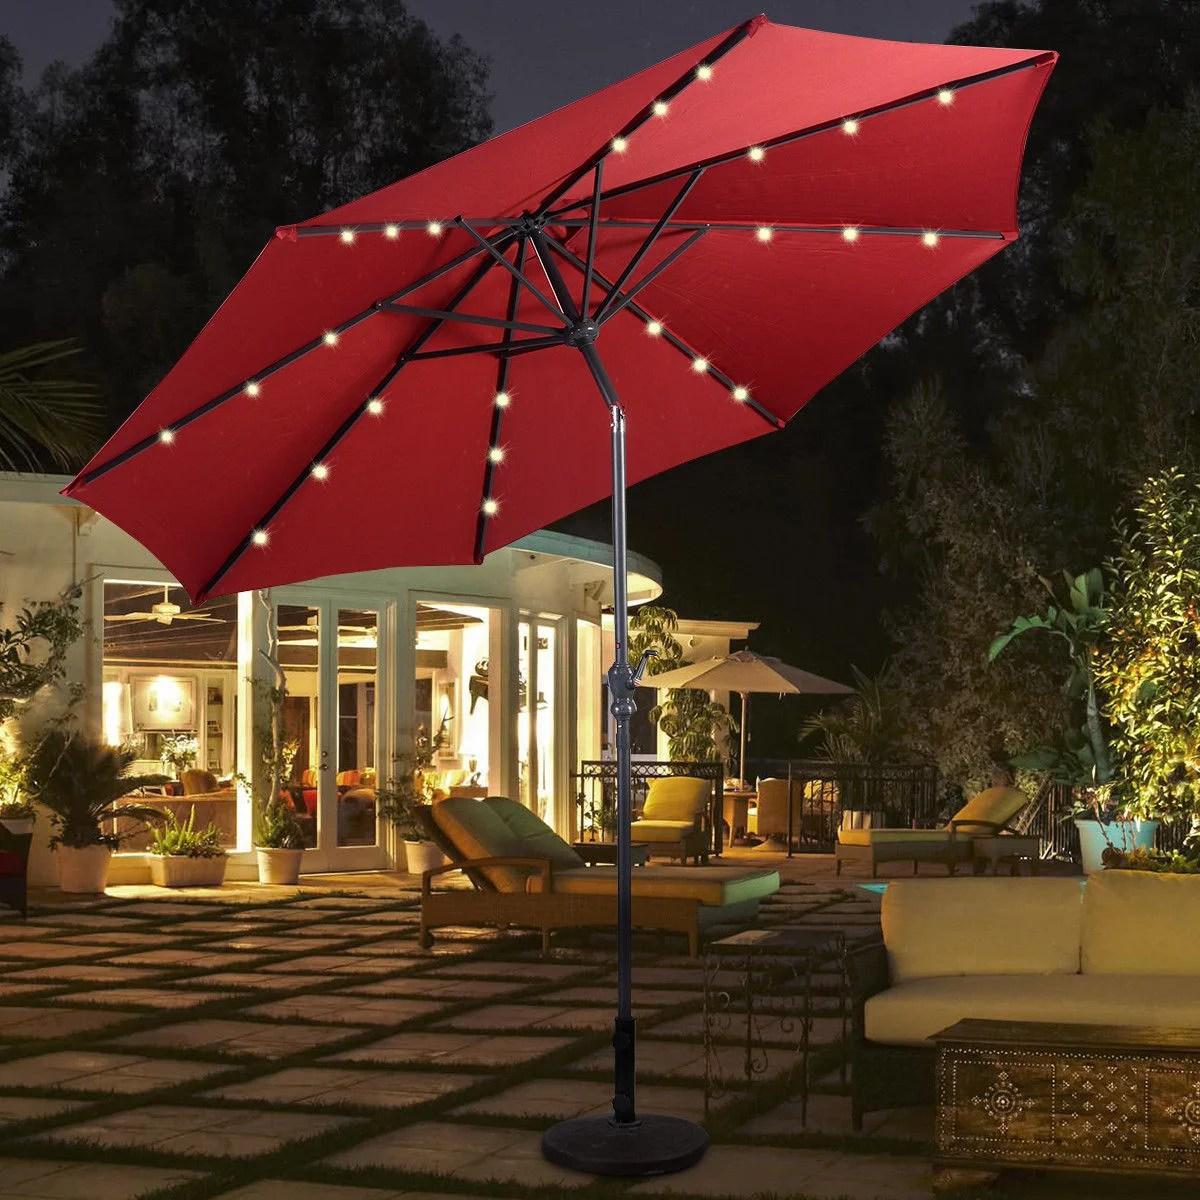 costway 10ft patio solar umbrella led patio market steel tilt w crank burgundy